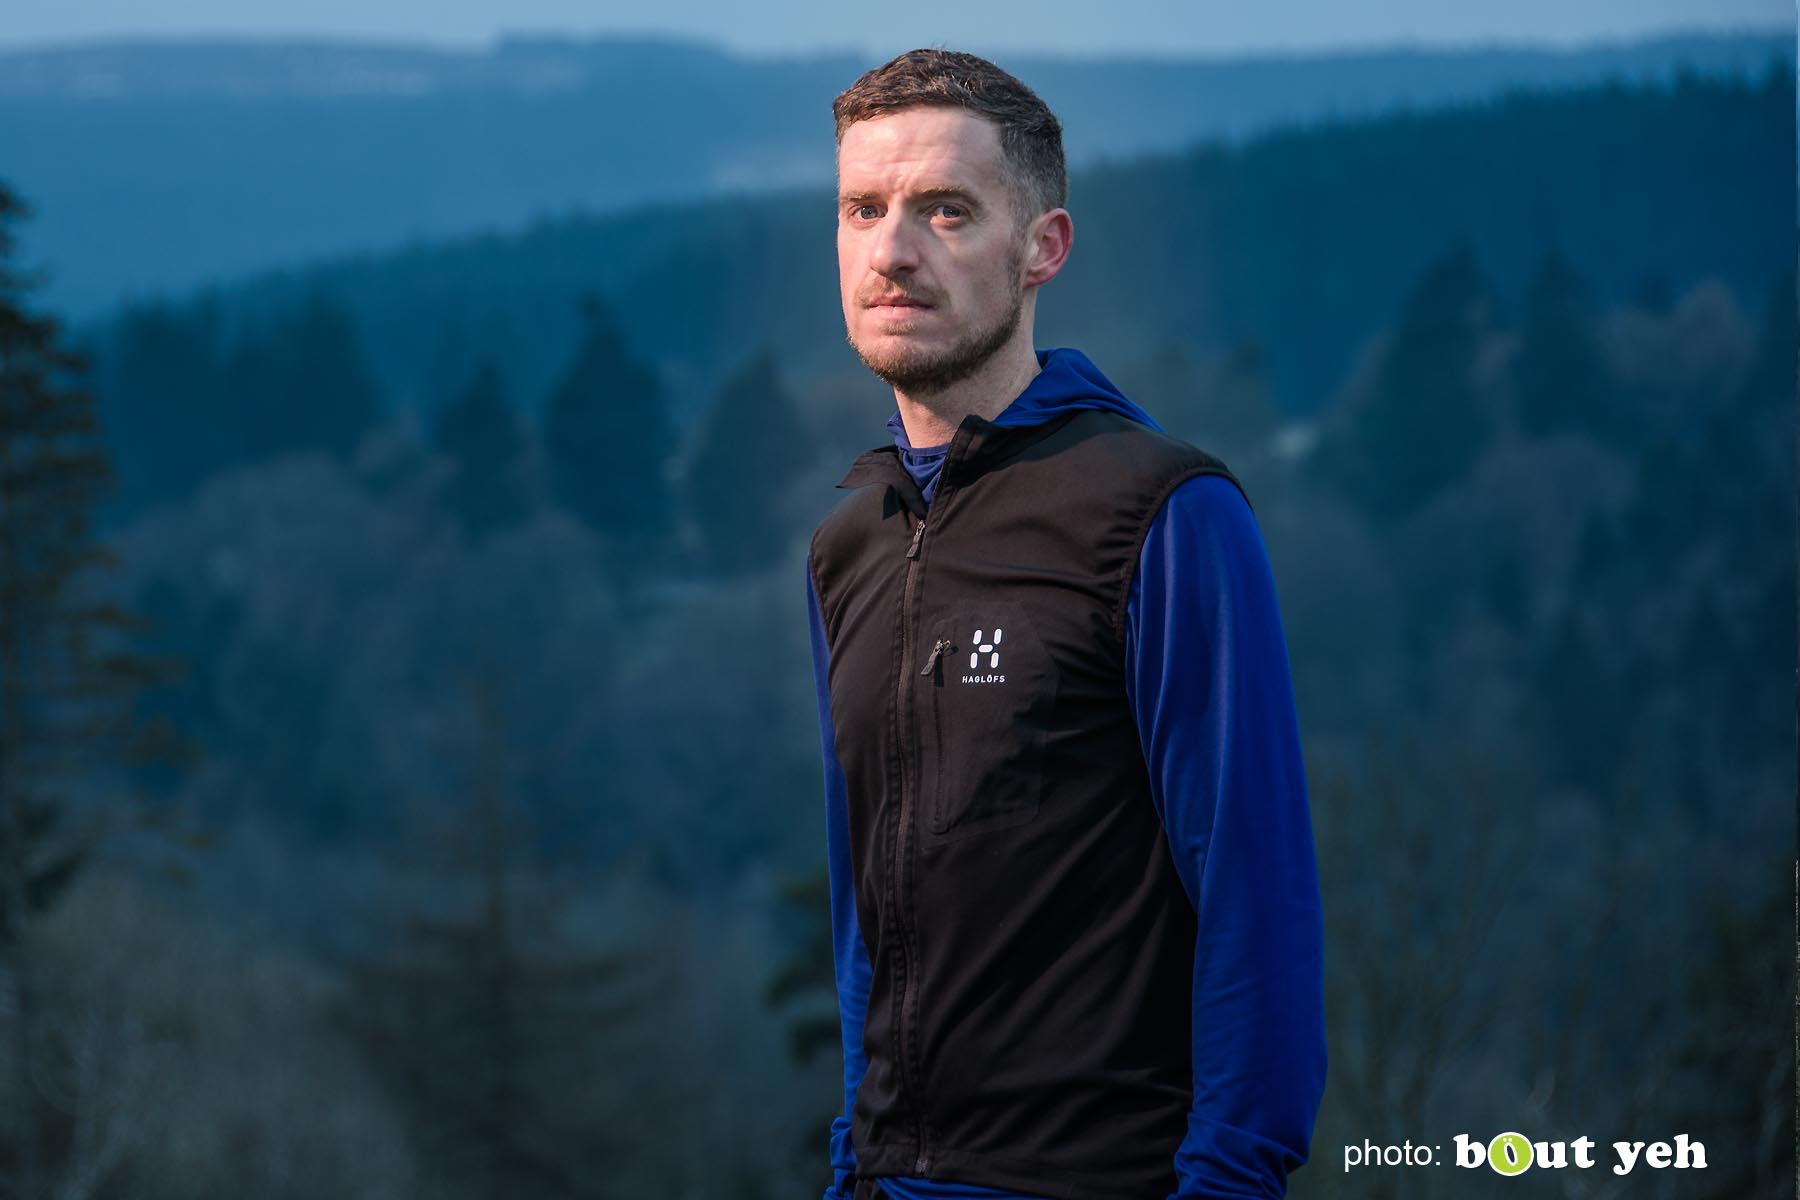 Tim, of Ballymena Runners, at Glenariff Forest, Northern Ireland - photo 0613.